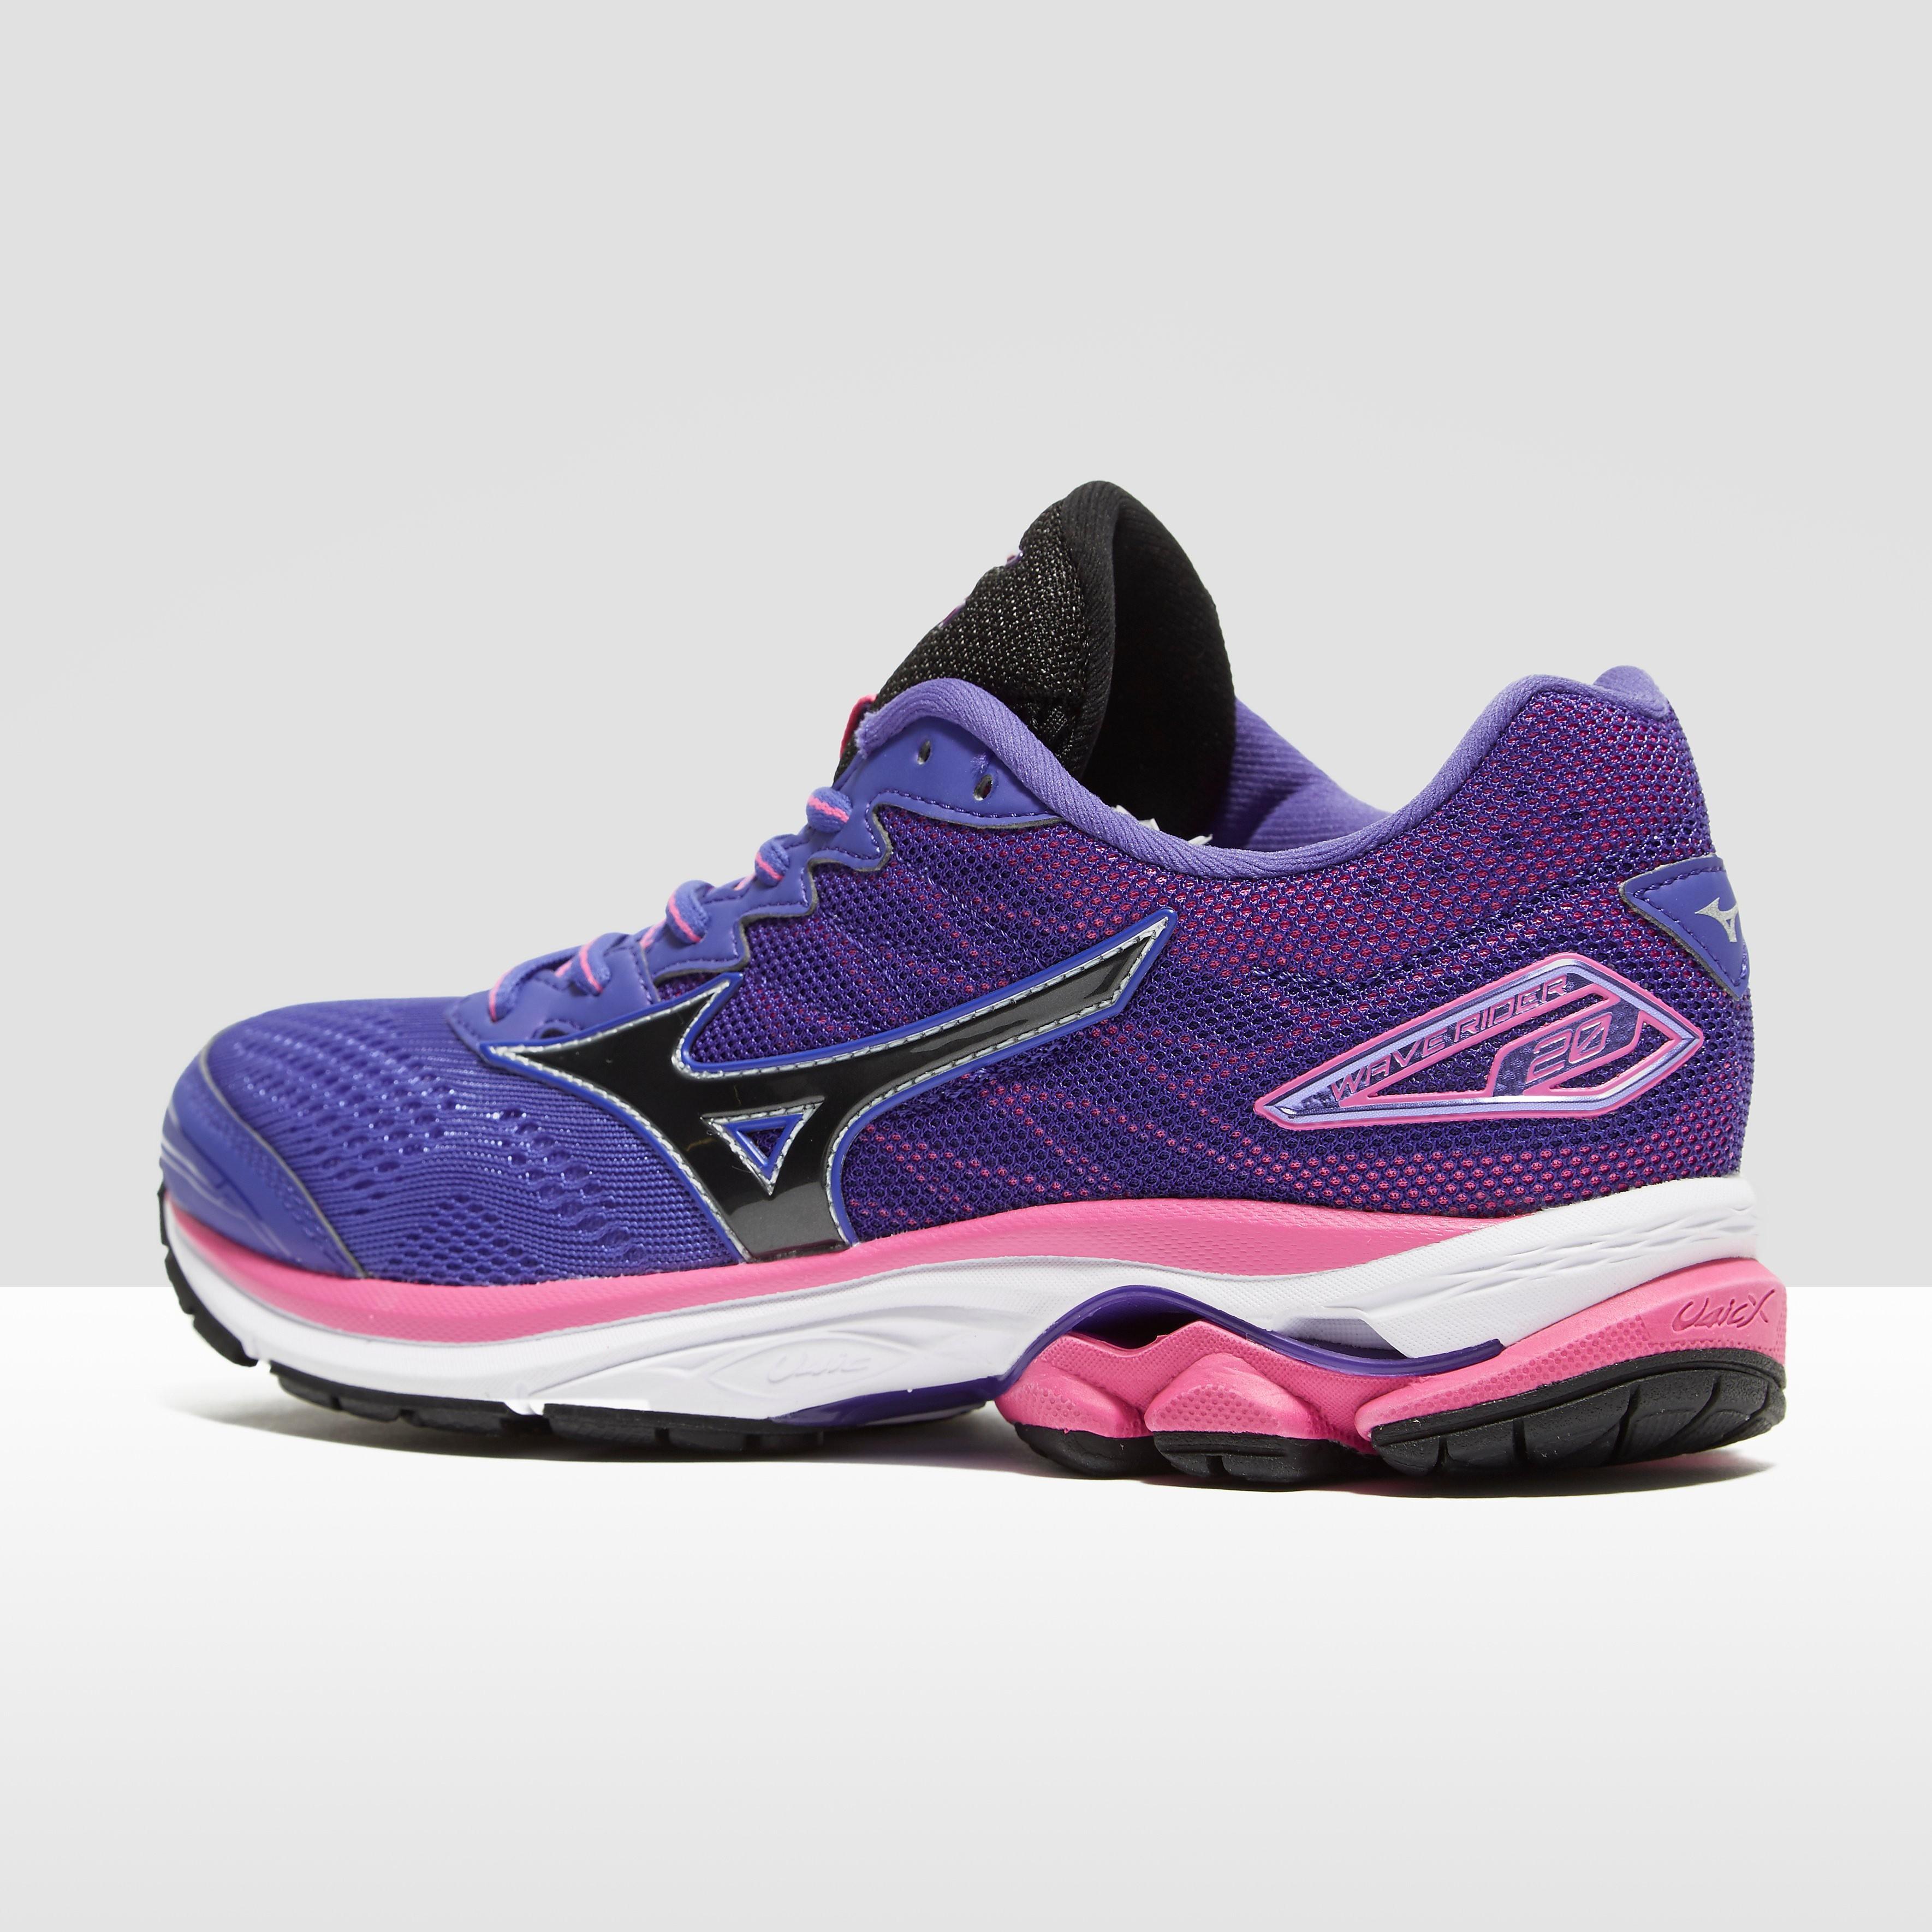 Mizuno Wave Rider 20 Women's Running Shoes